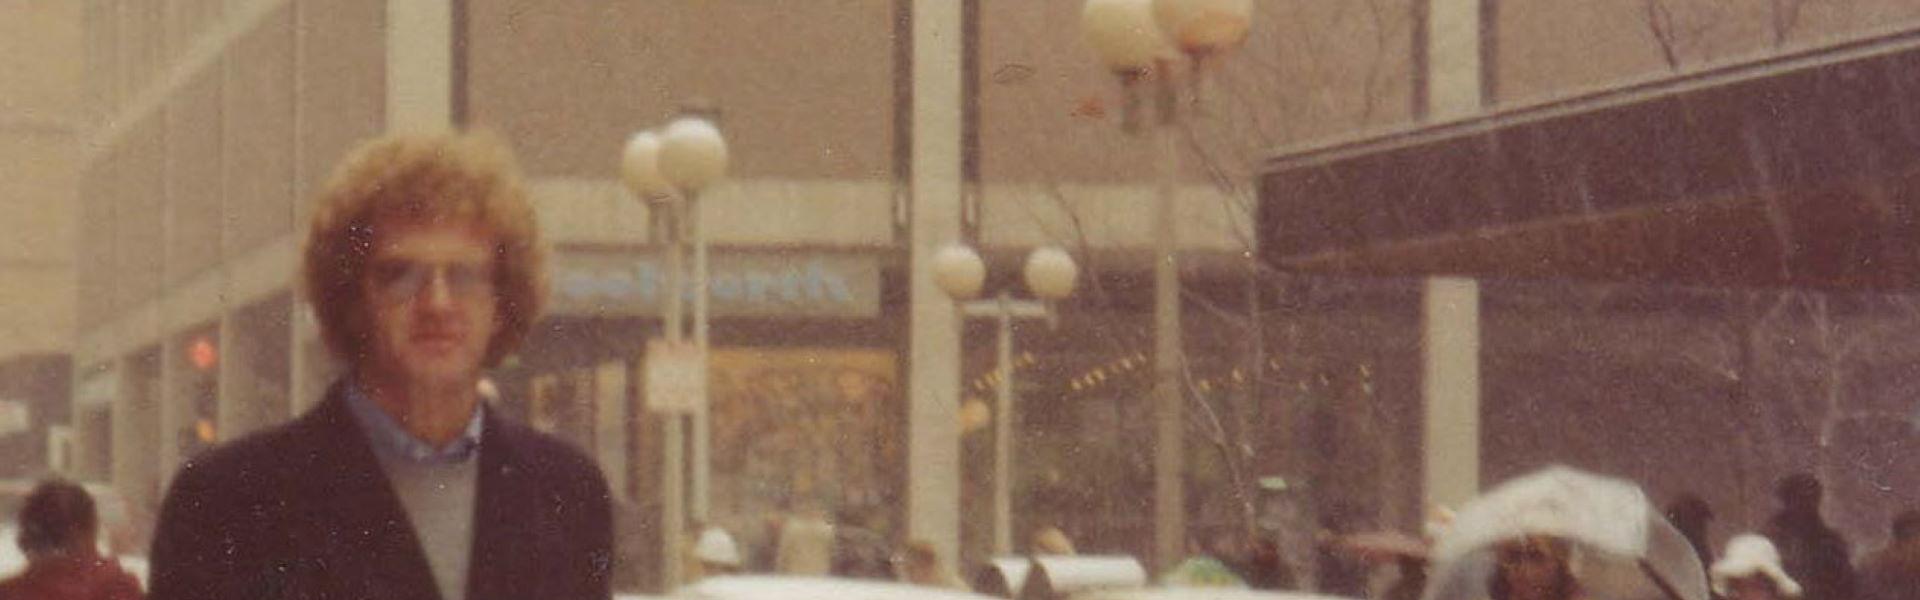 Graham Carbery, US or Toronto, Dec 1977 or Jan1978 – Banner Web